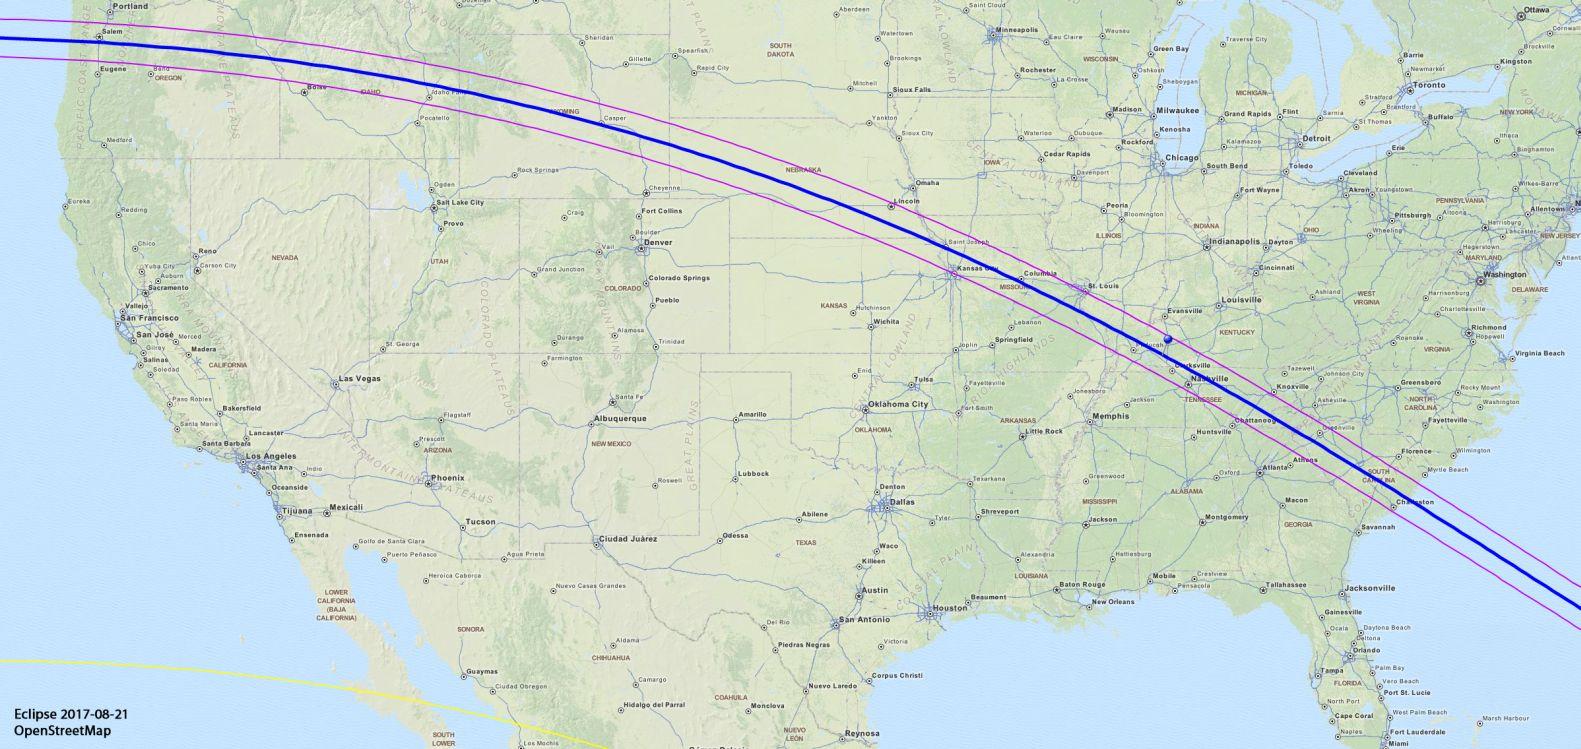 Eclipse - Us eclipse 2017 map